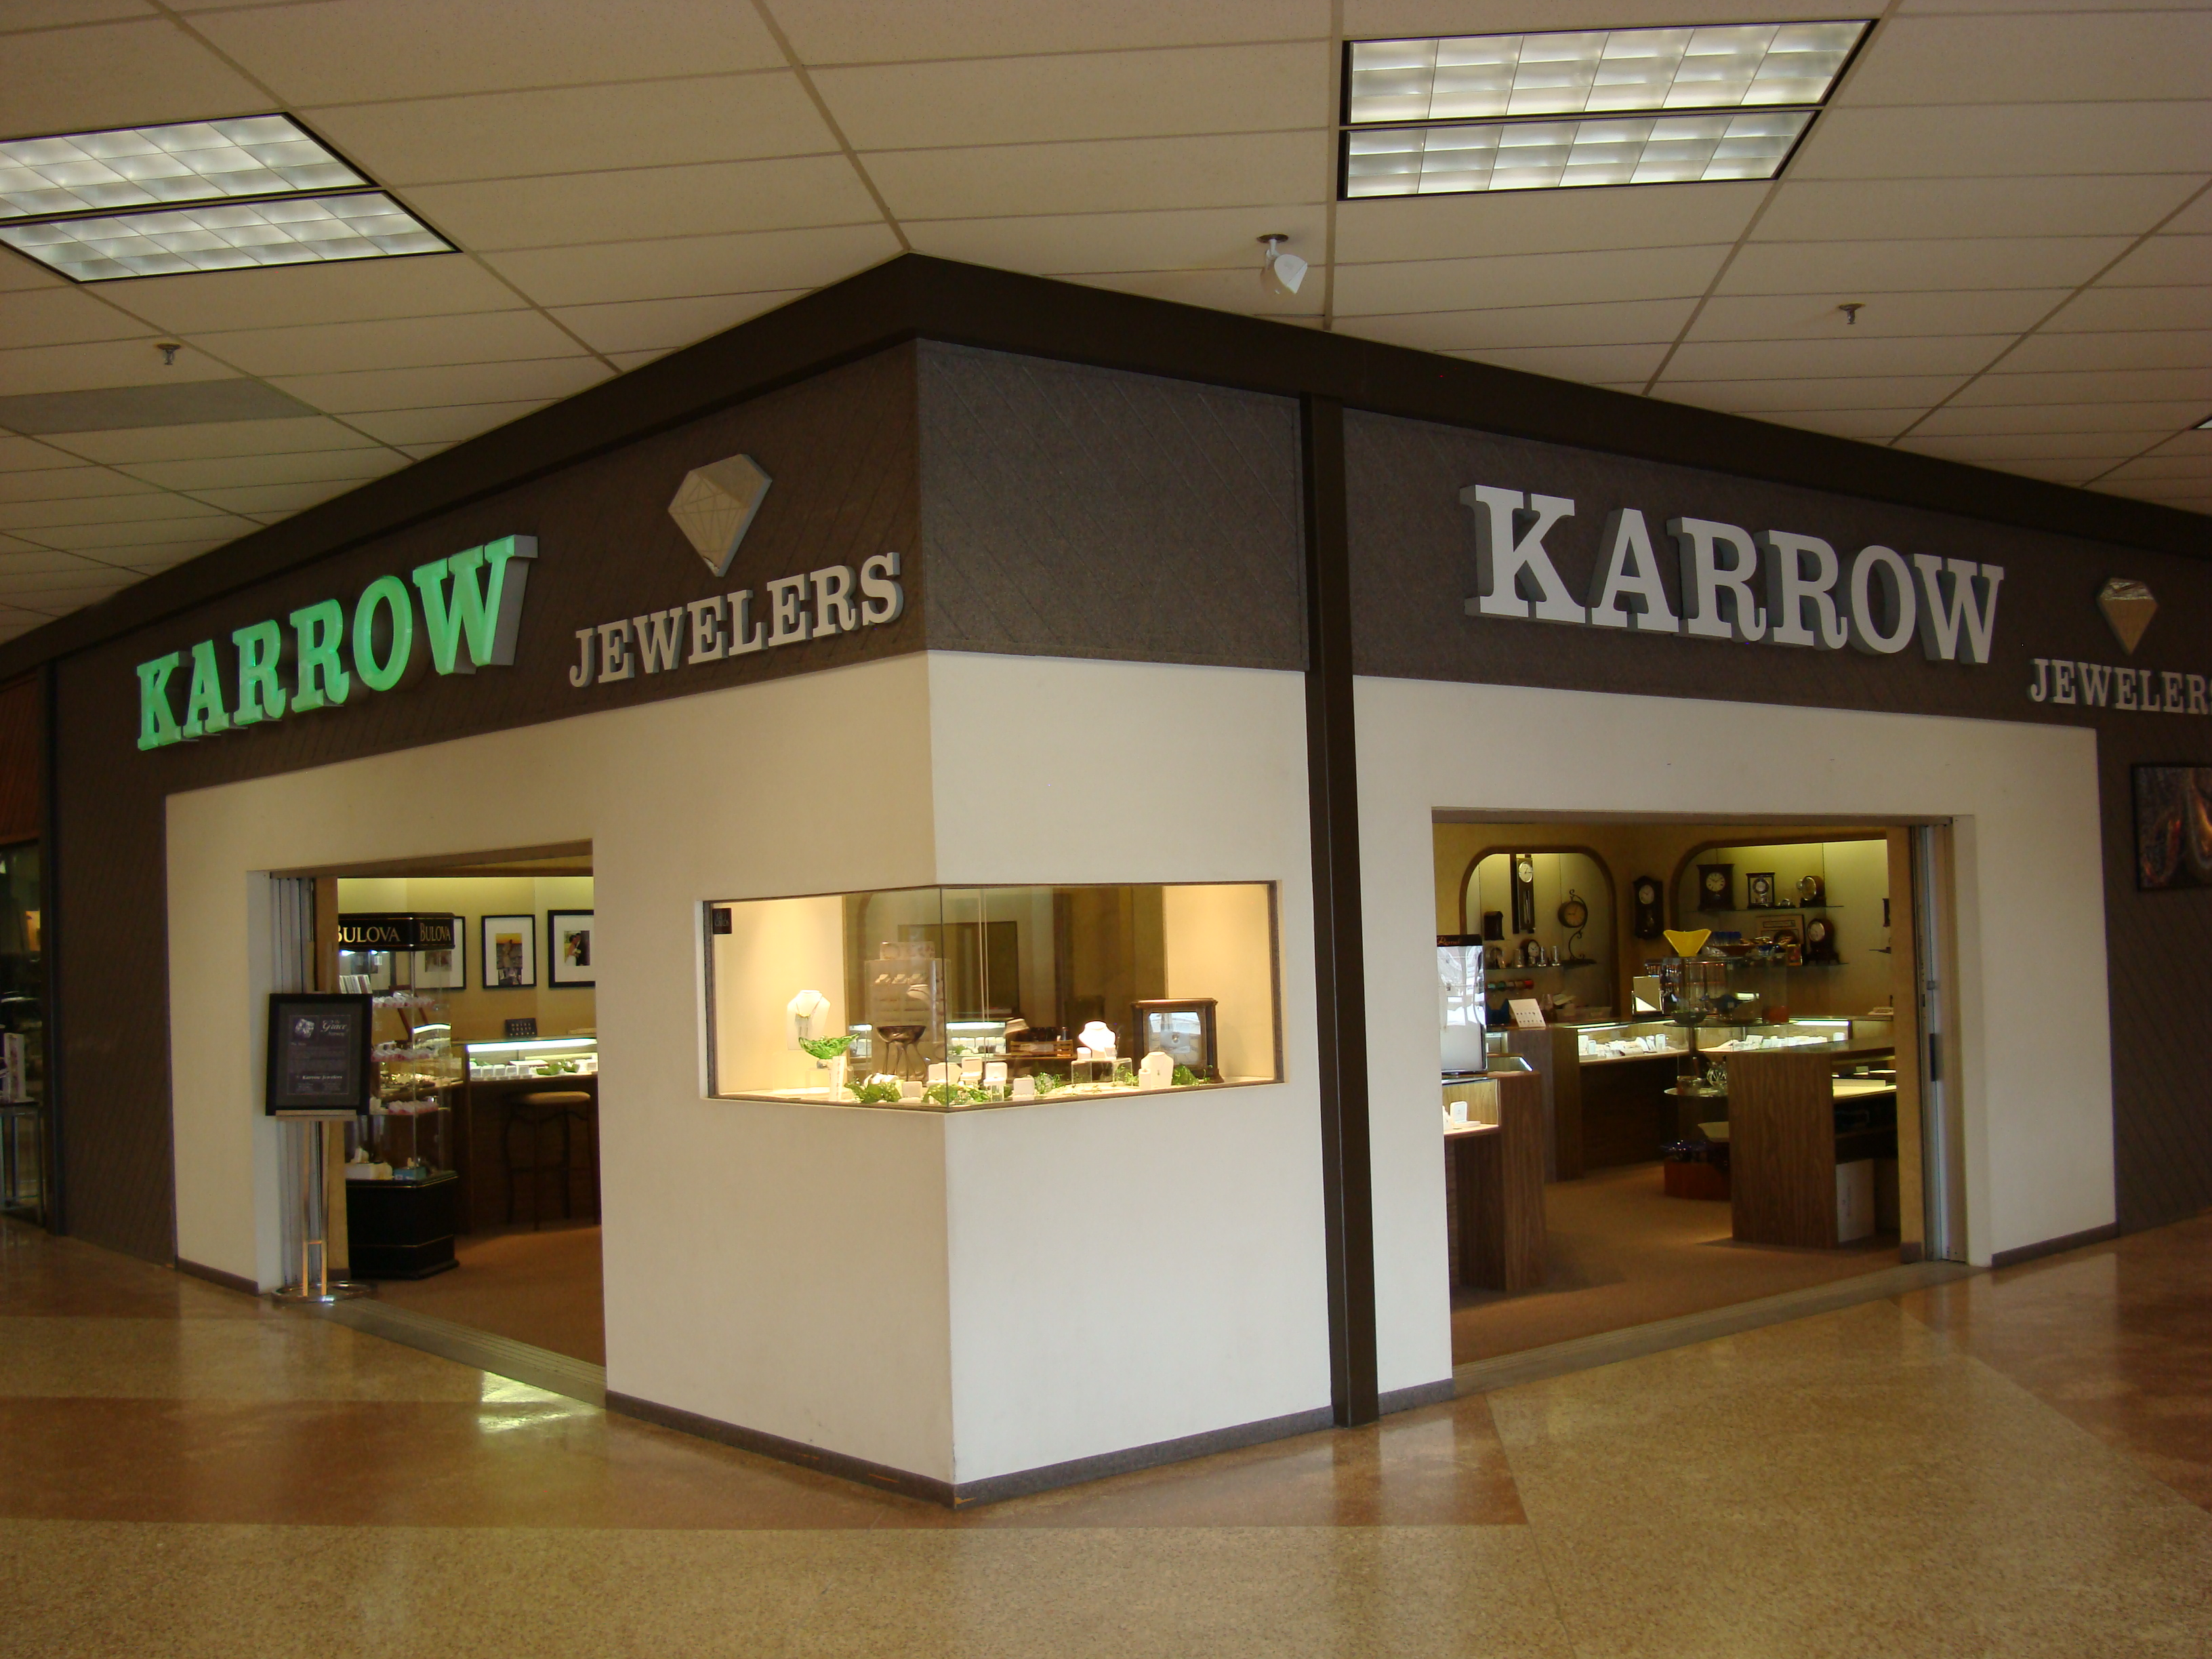 Karrow Jewelers exterior Viking Plaza Mall location